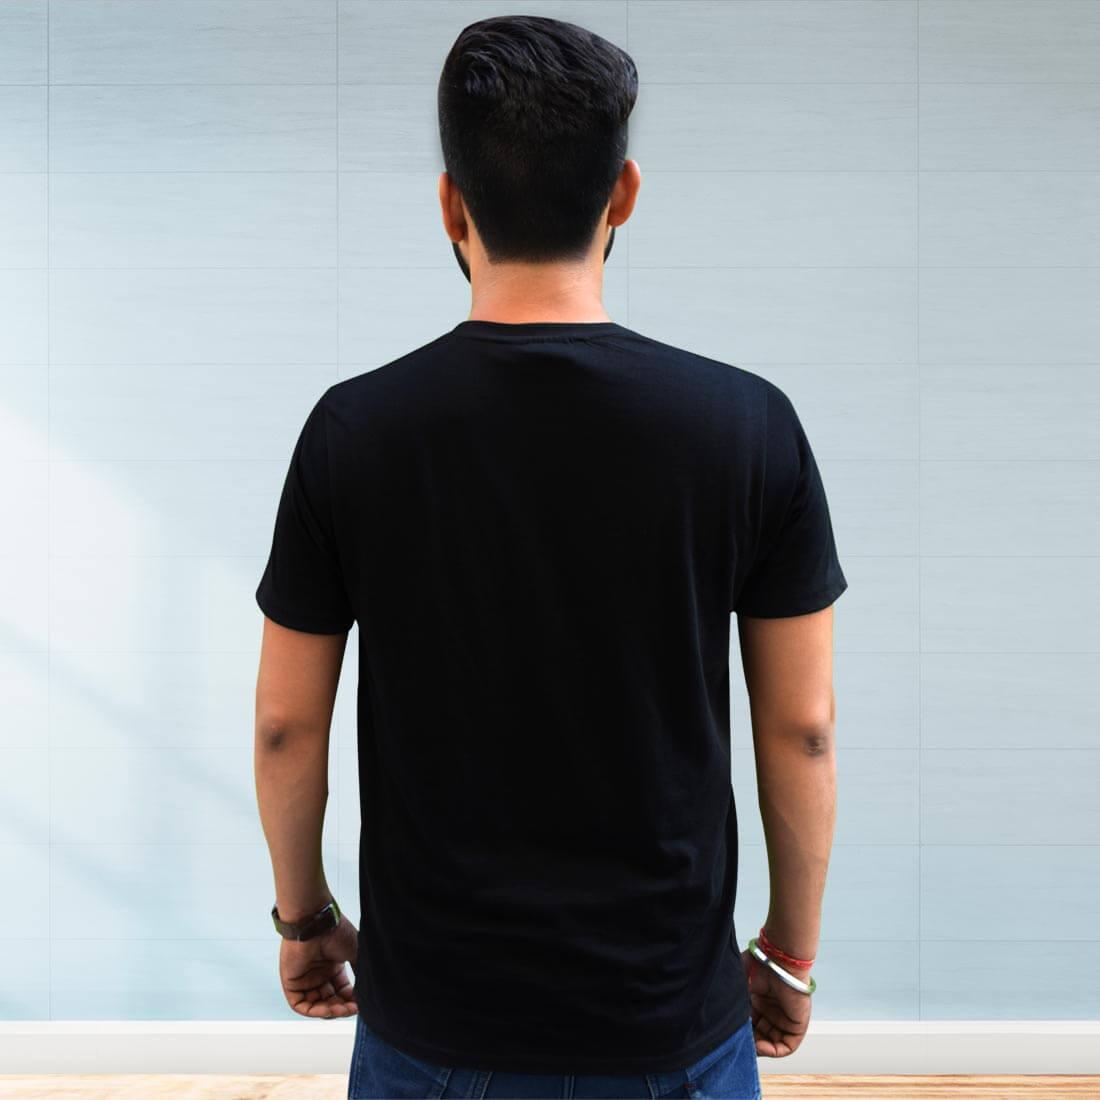 Dance Lover Bapa Printed Black T Shirt Front and Back